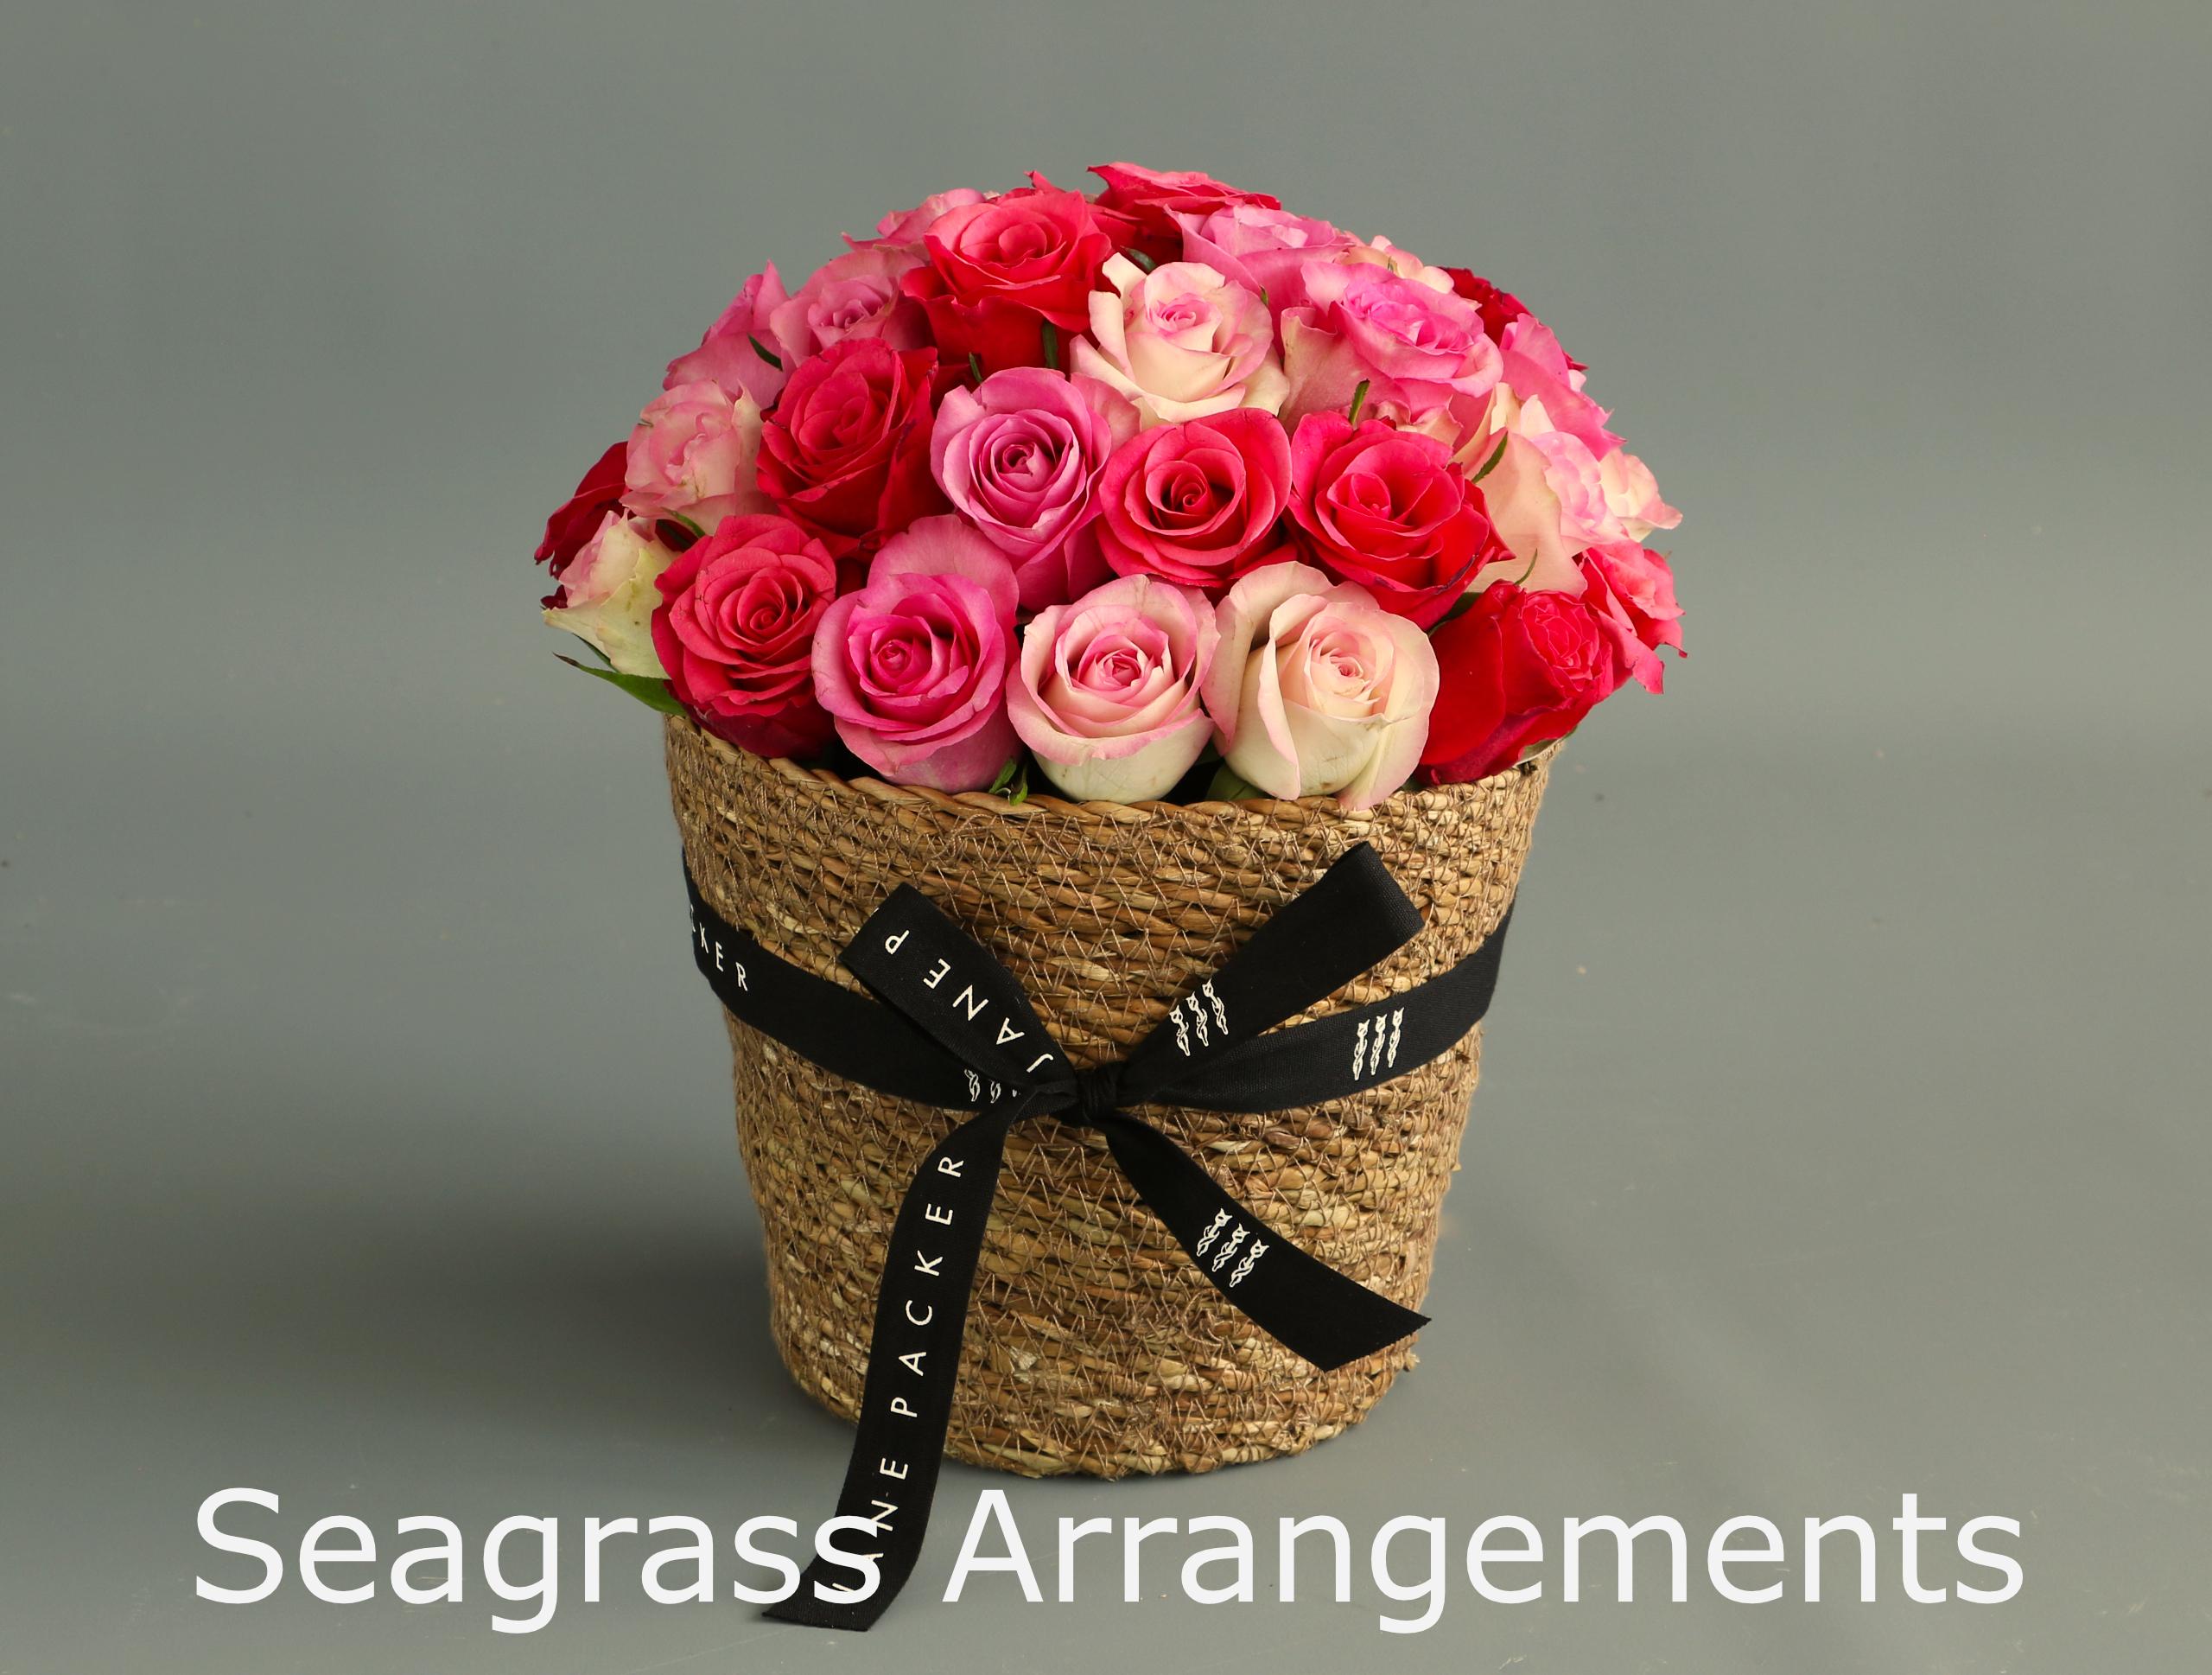 Seagrass Arrangements